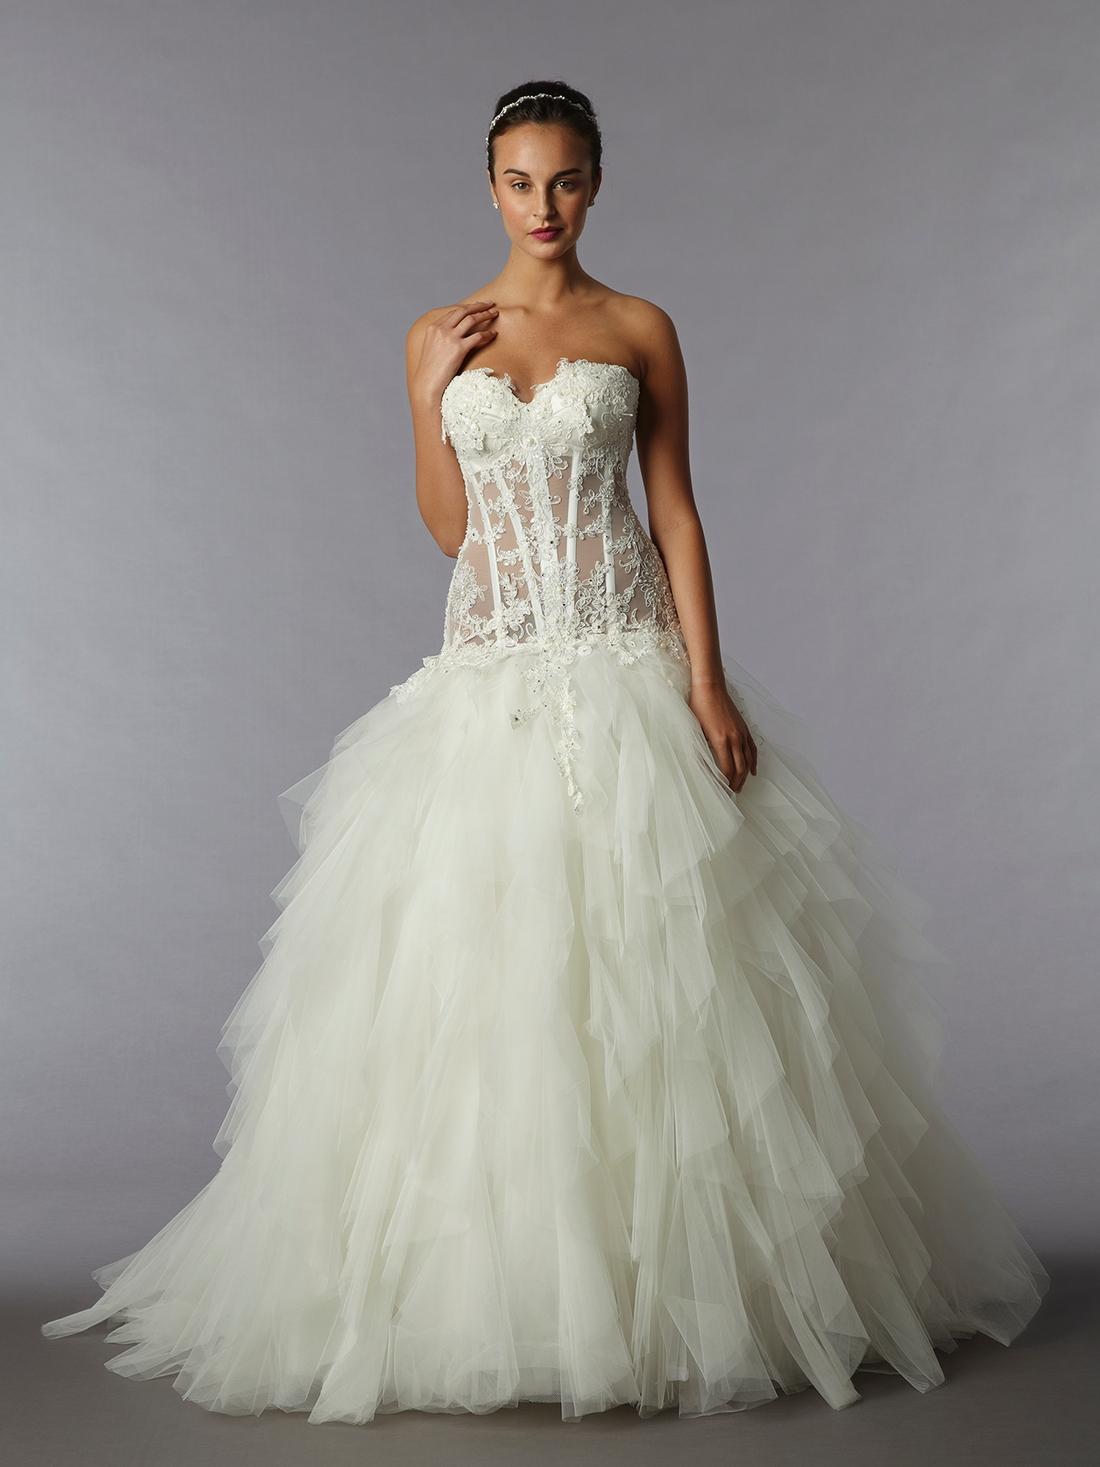 pnina tornai see through wedding dresses photo - 1